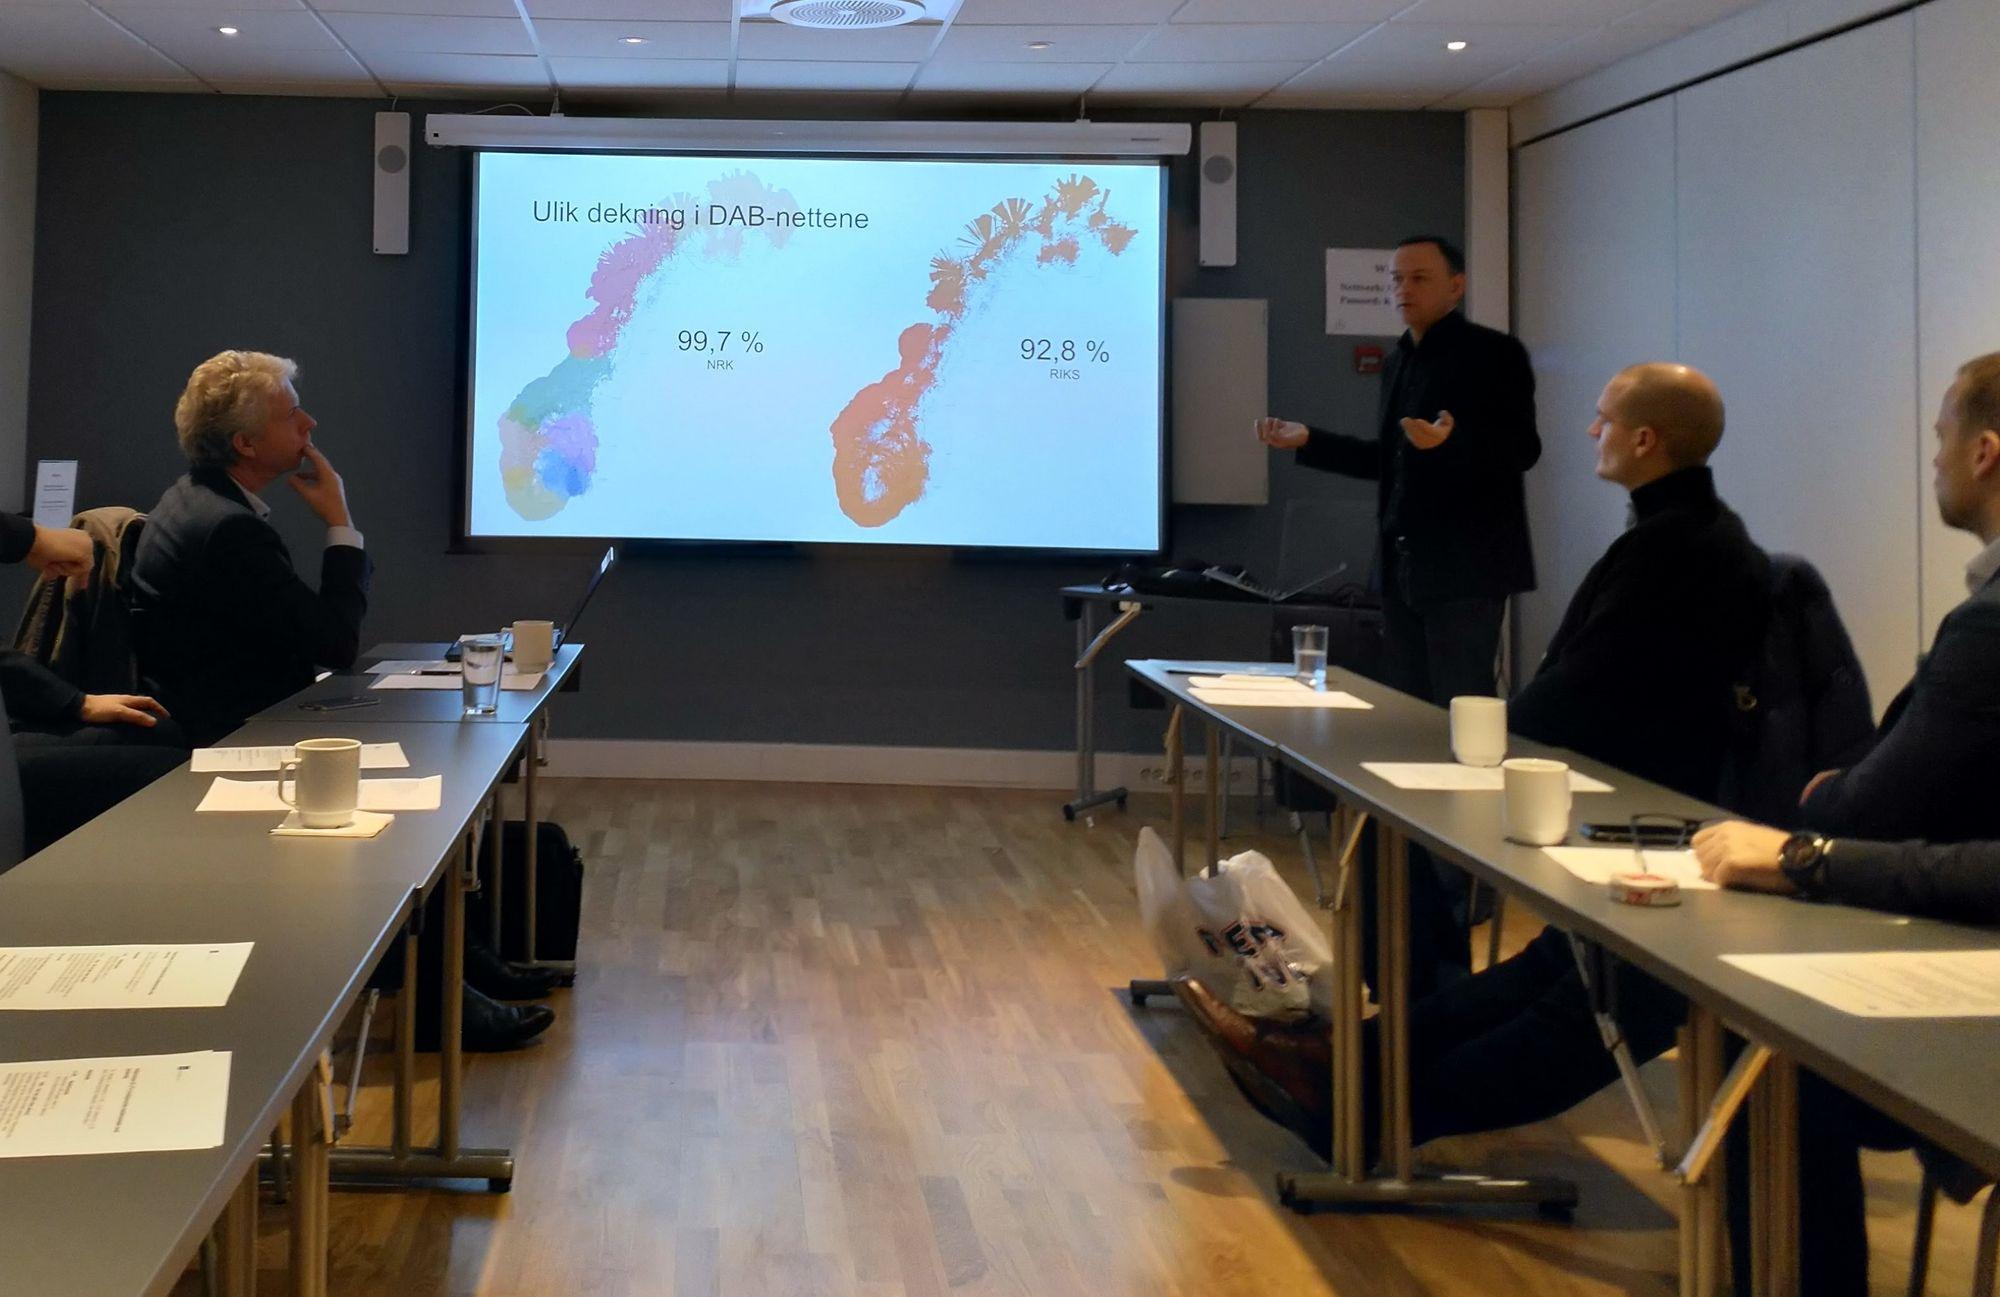 Kommunikasjonssjef marked i Digitalradio Norge, Jarle Ruud, la fram nye tall for radiolyttingen. Foto: Marte Ottemo.